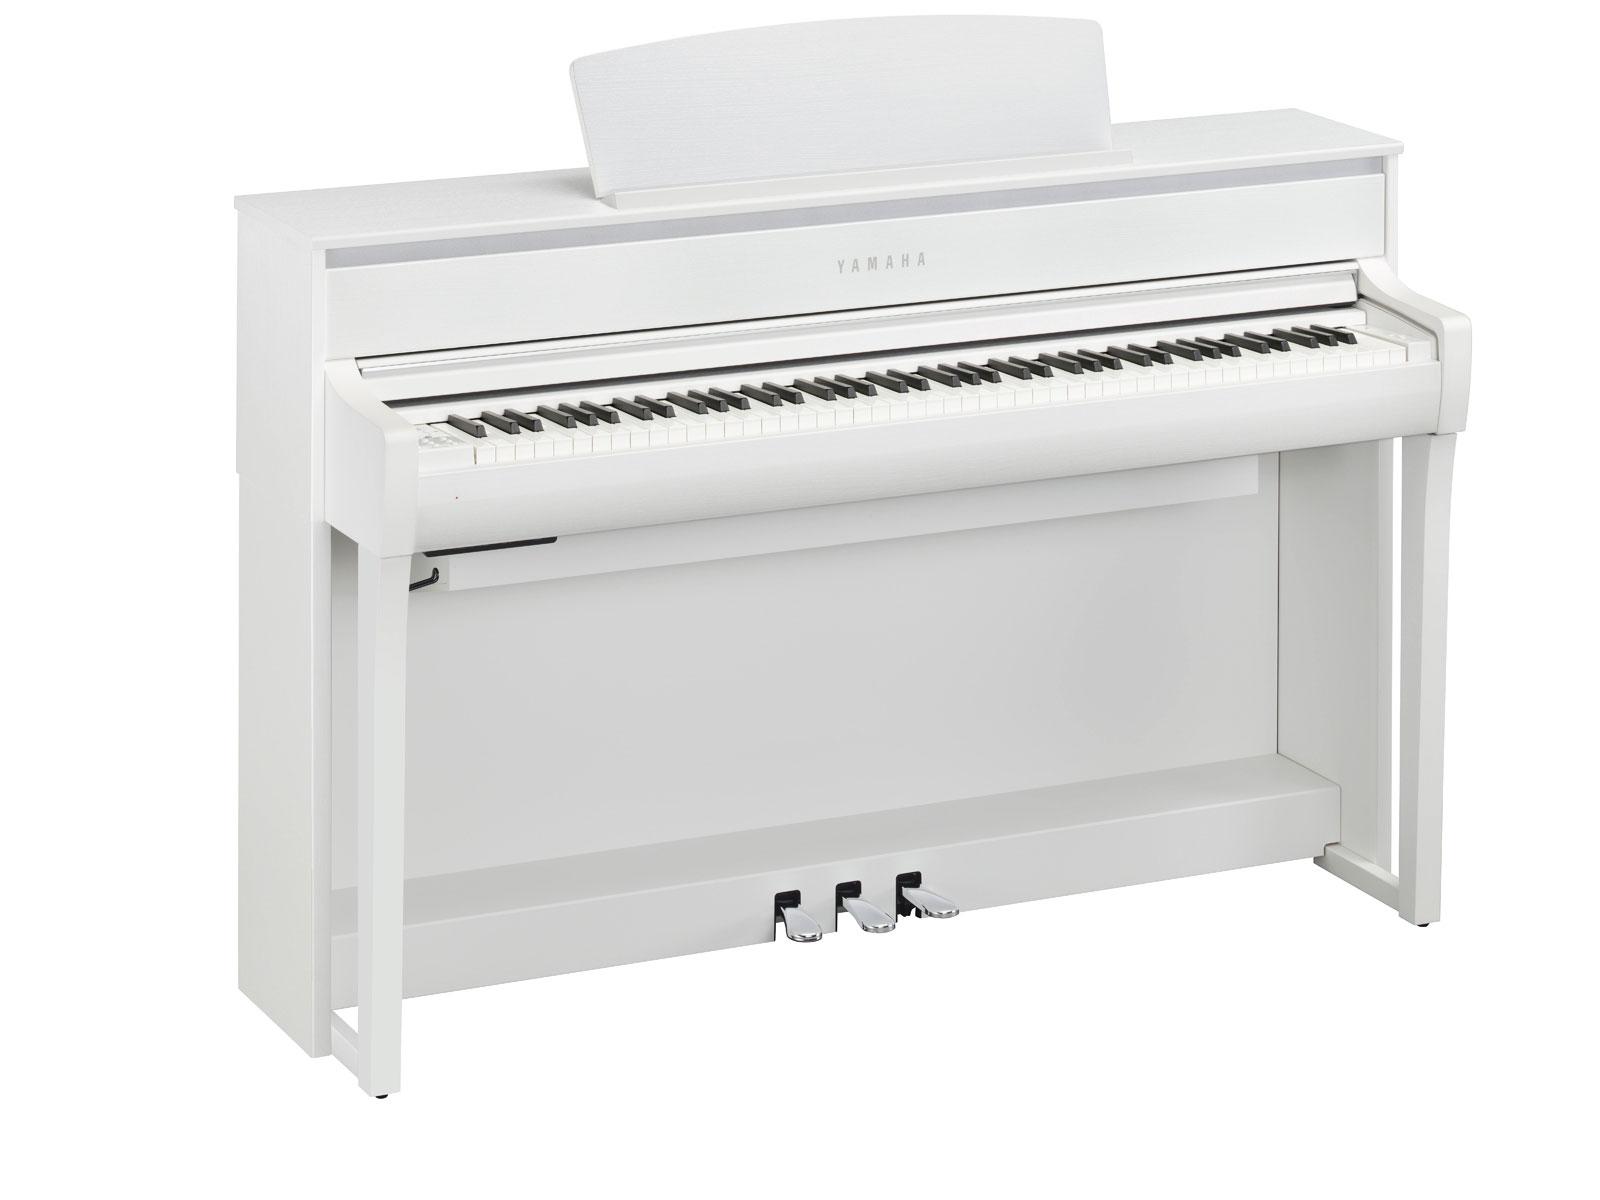 Yamaha clavinova clp635wh blanc piano buy online for Yamaha clavinova clp 110